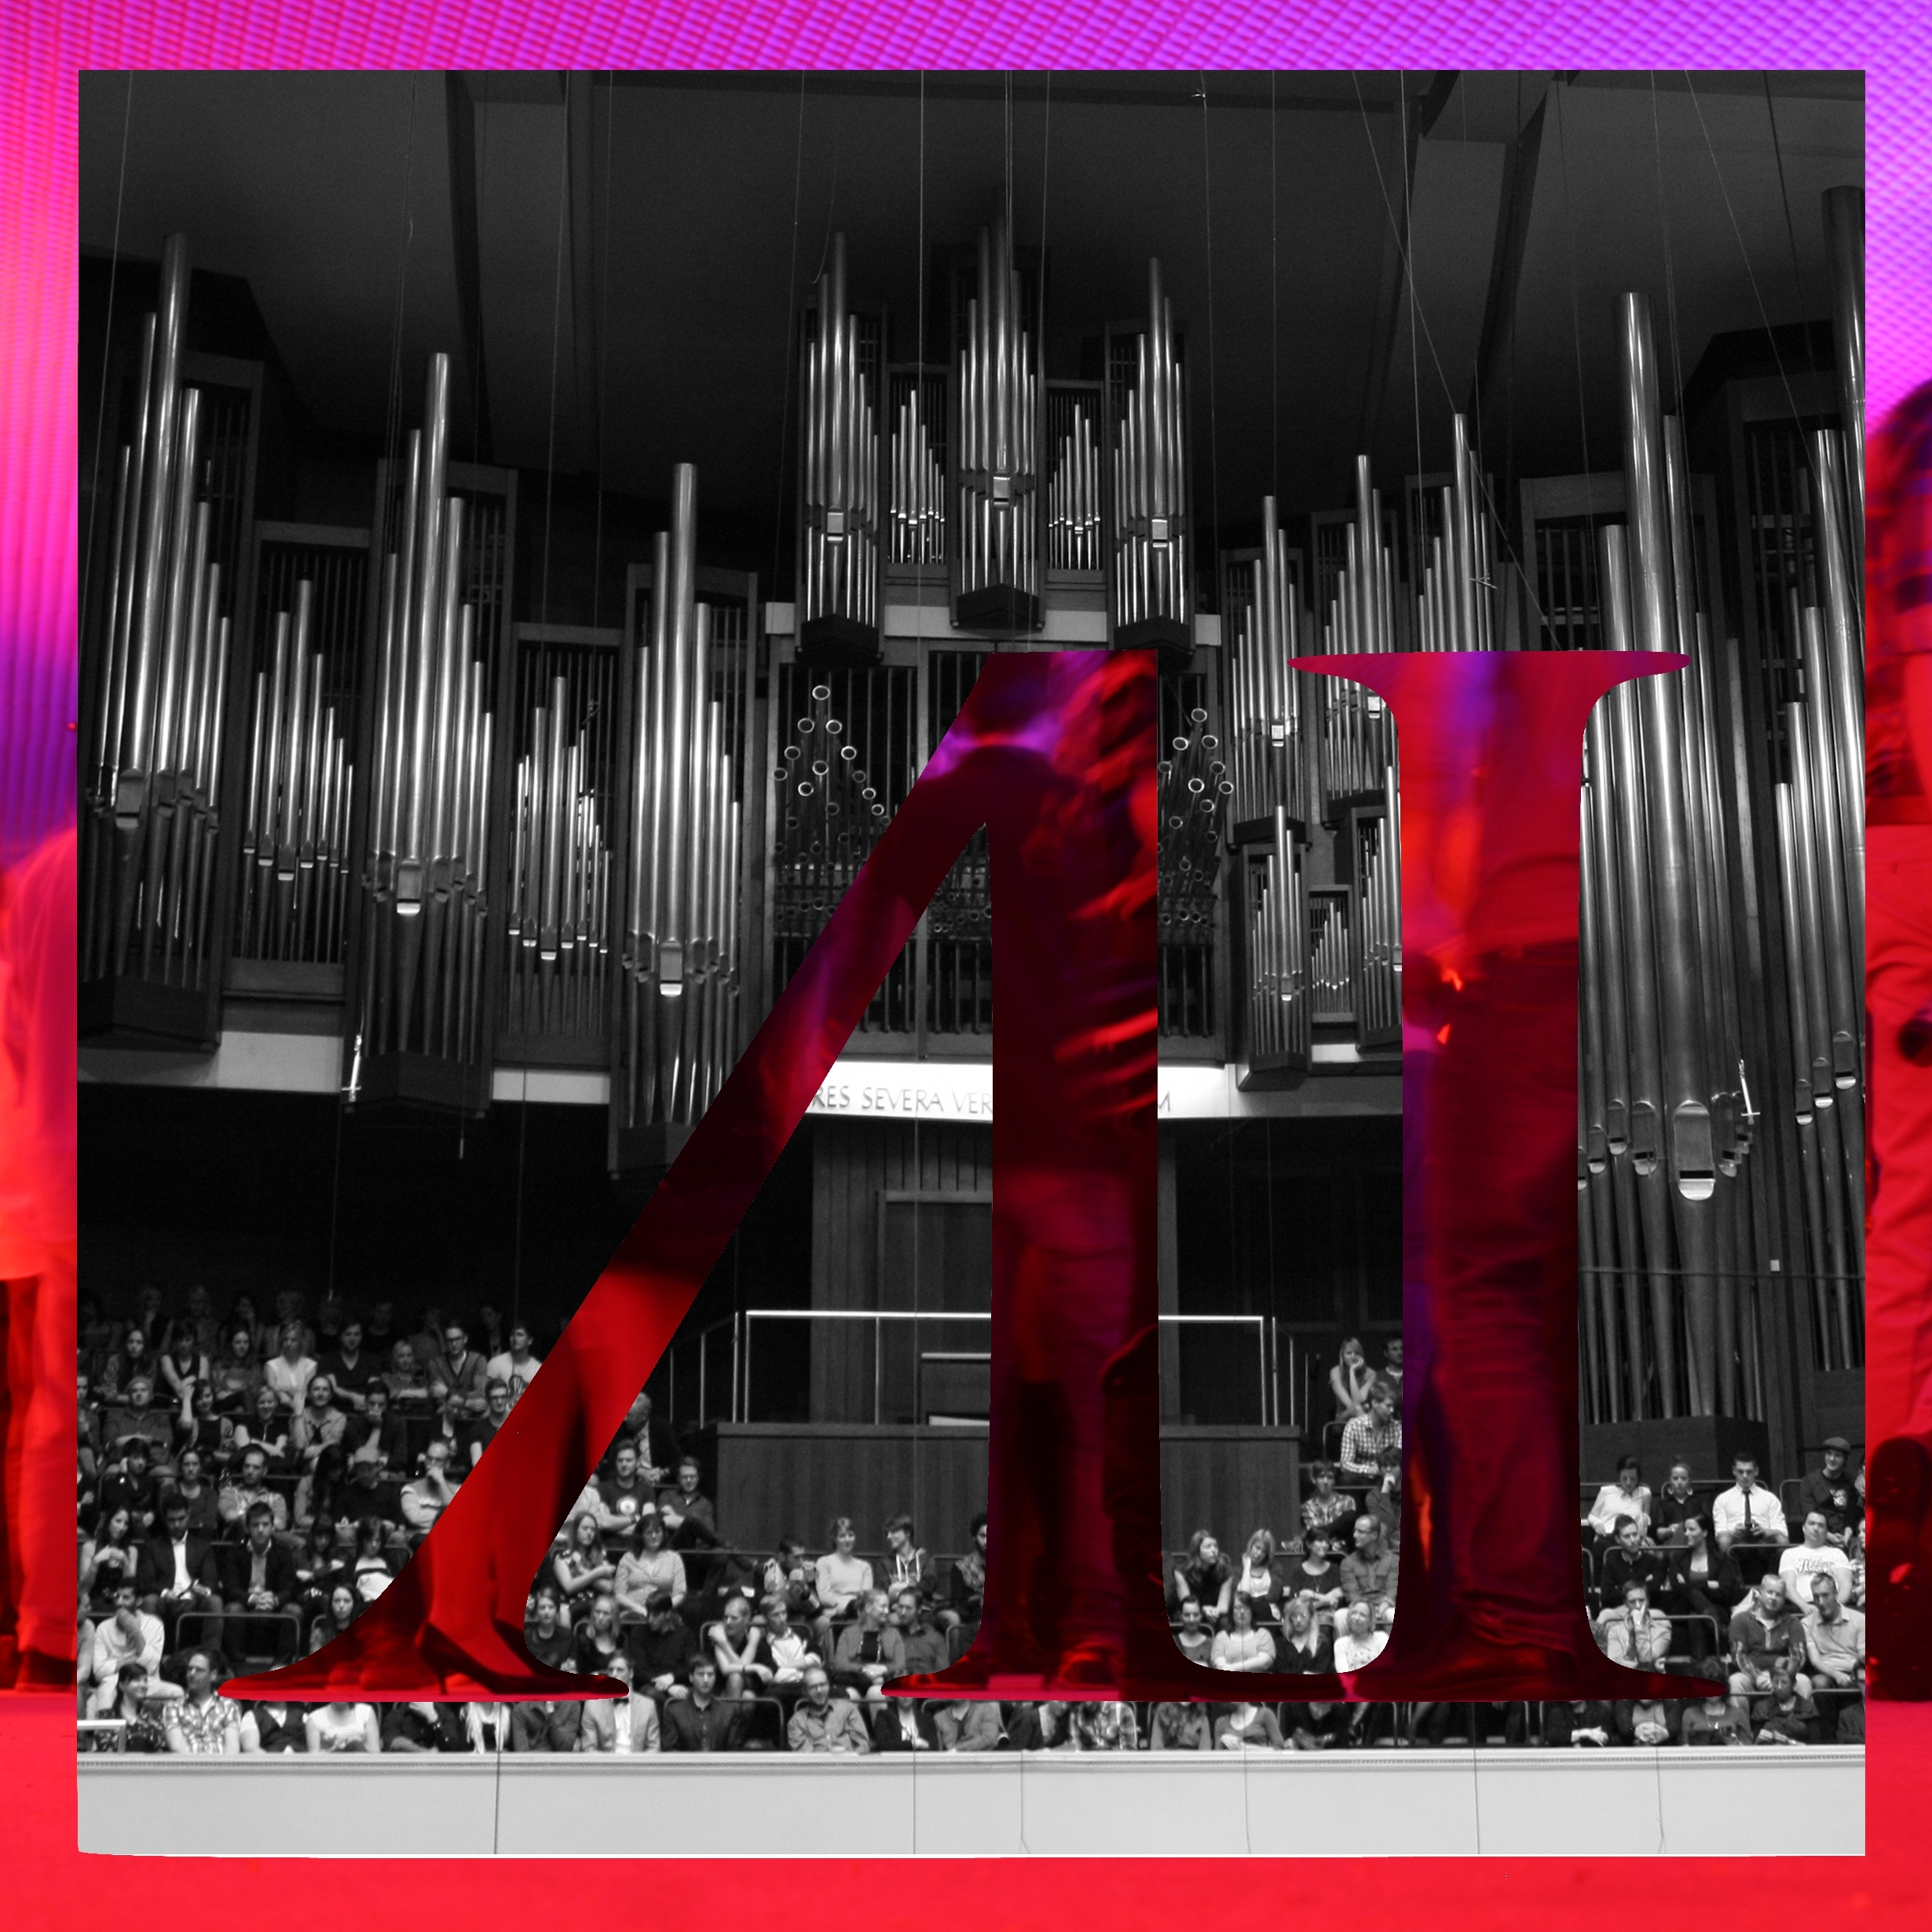 Audio Invasion 2011 - by Stefan Ibrahim